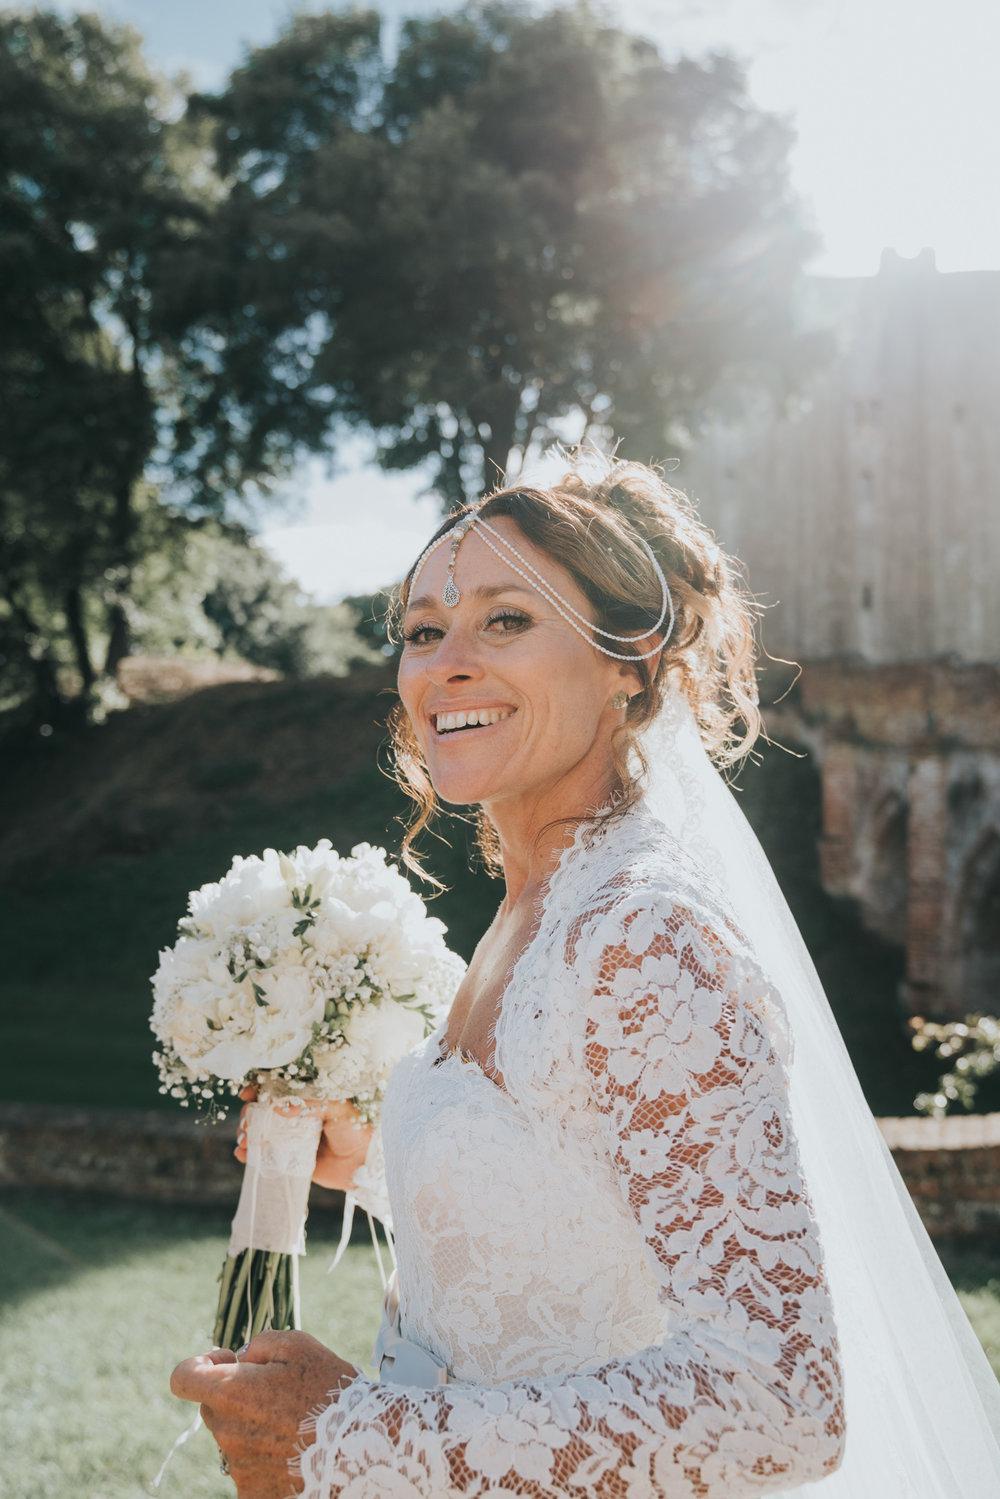 grace-elizabeth-boho-wedding-headingham-castle-essex-wedding-photographer-69.jpg